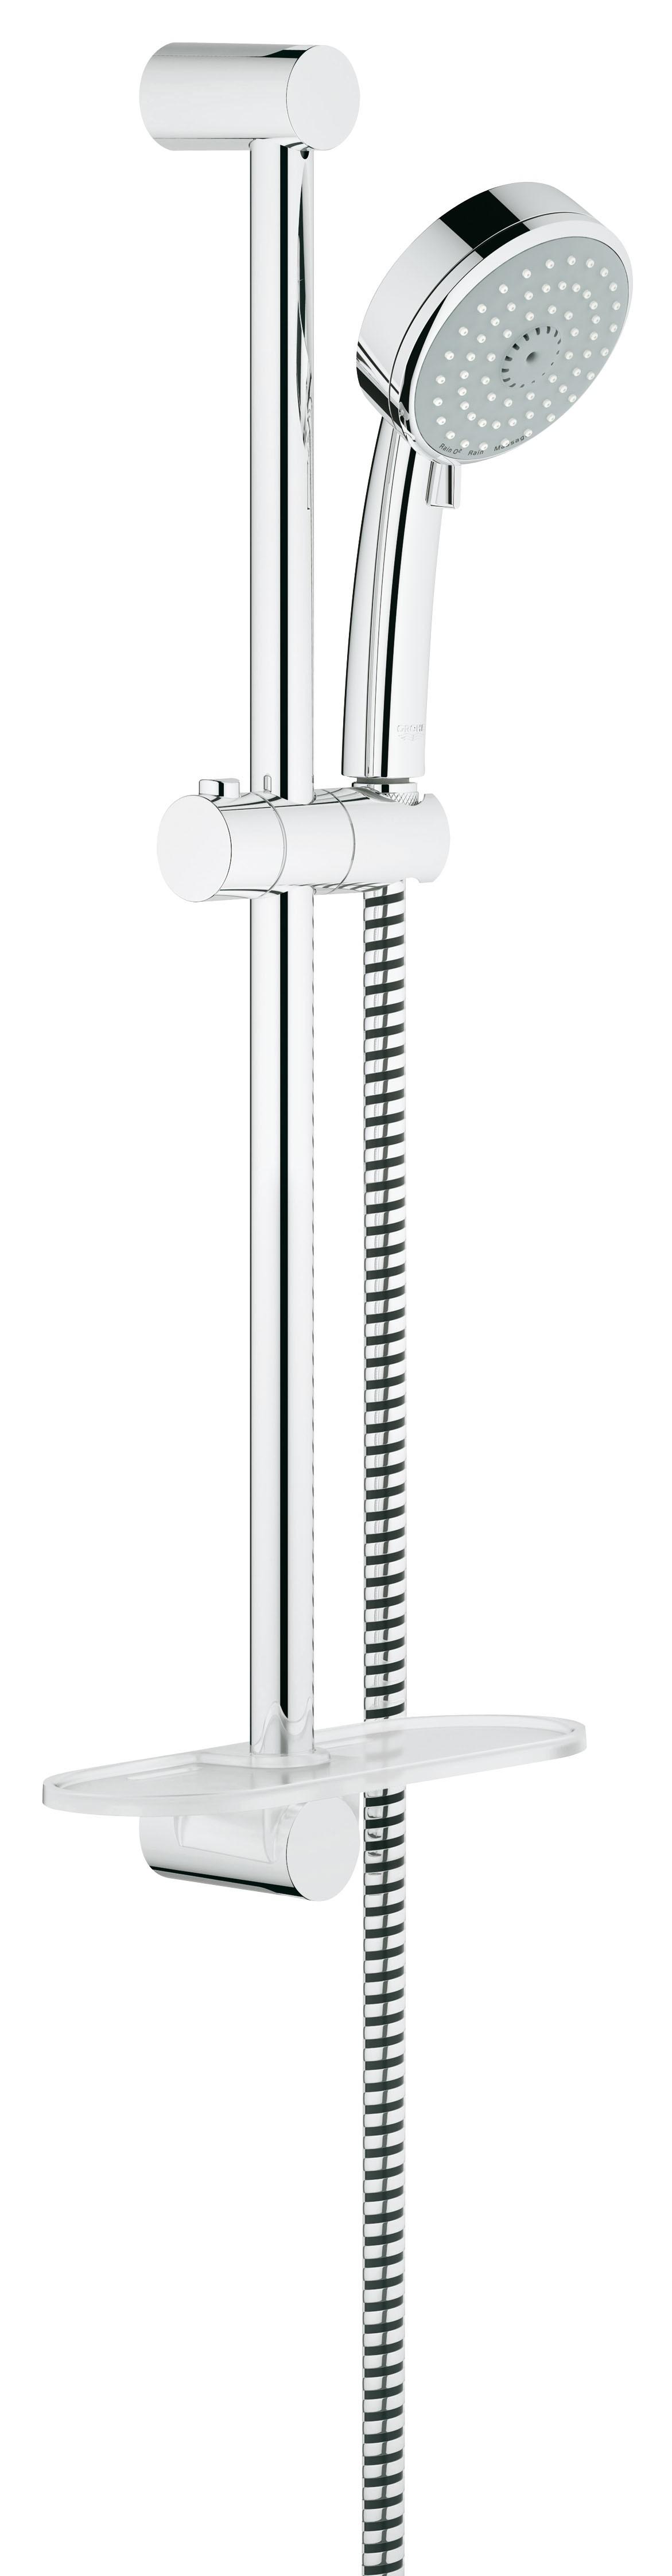 Душевой гарнитур Grohe 27929001 Tempesta Cosmopolitan (ручной душ, штанга 600 мм, шланг 1750 мм), хром